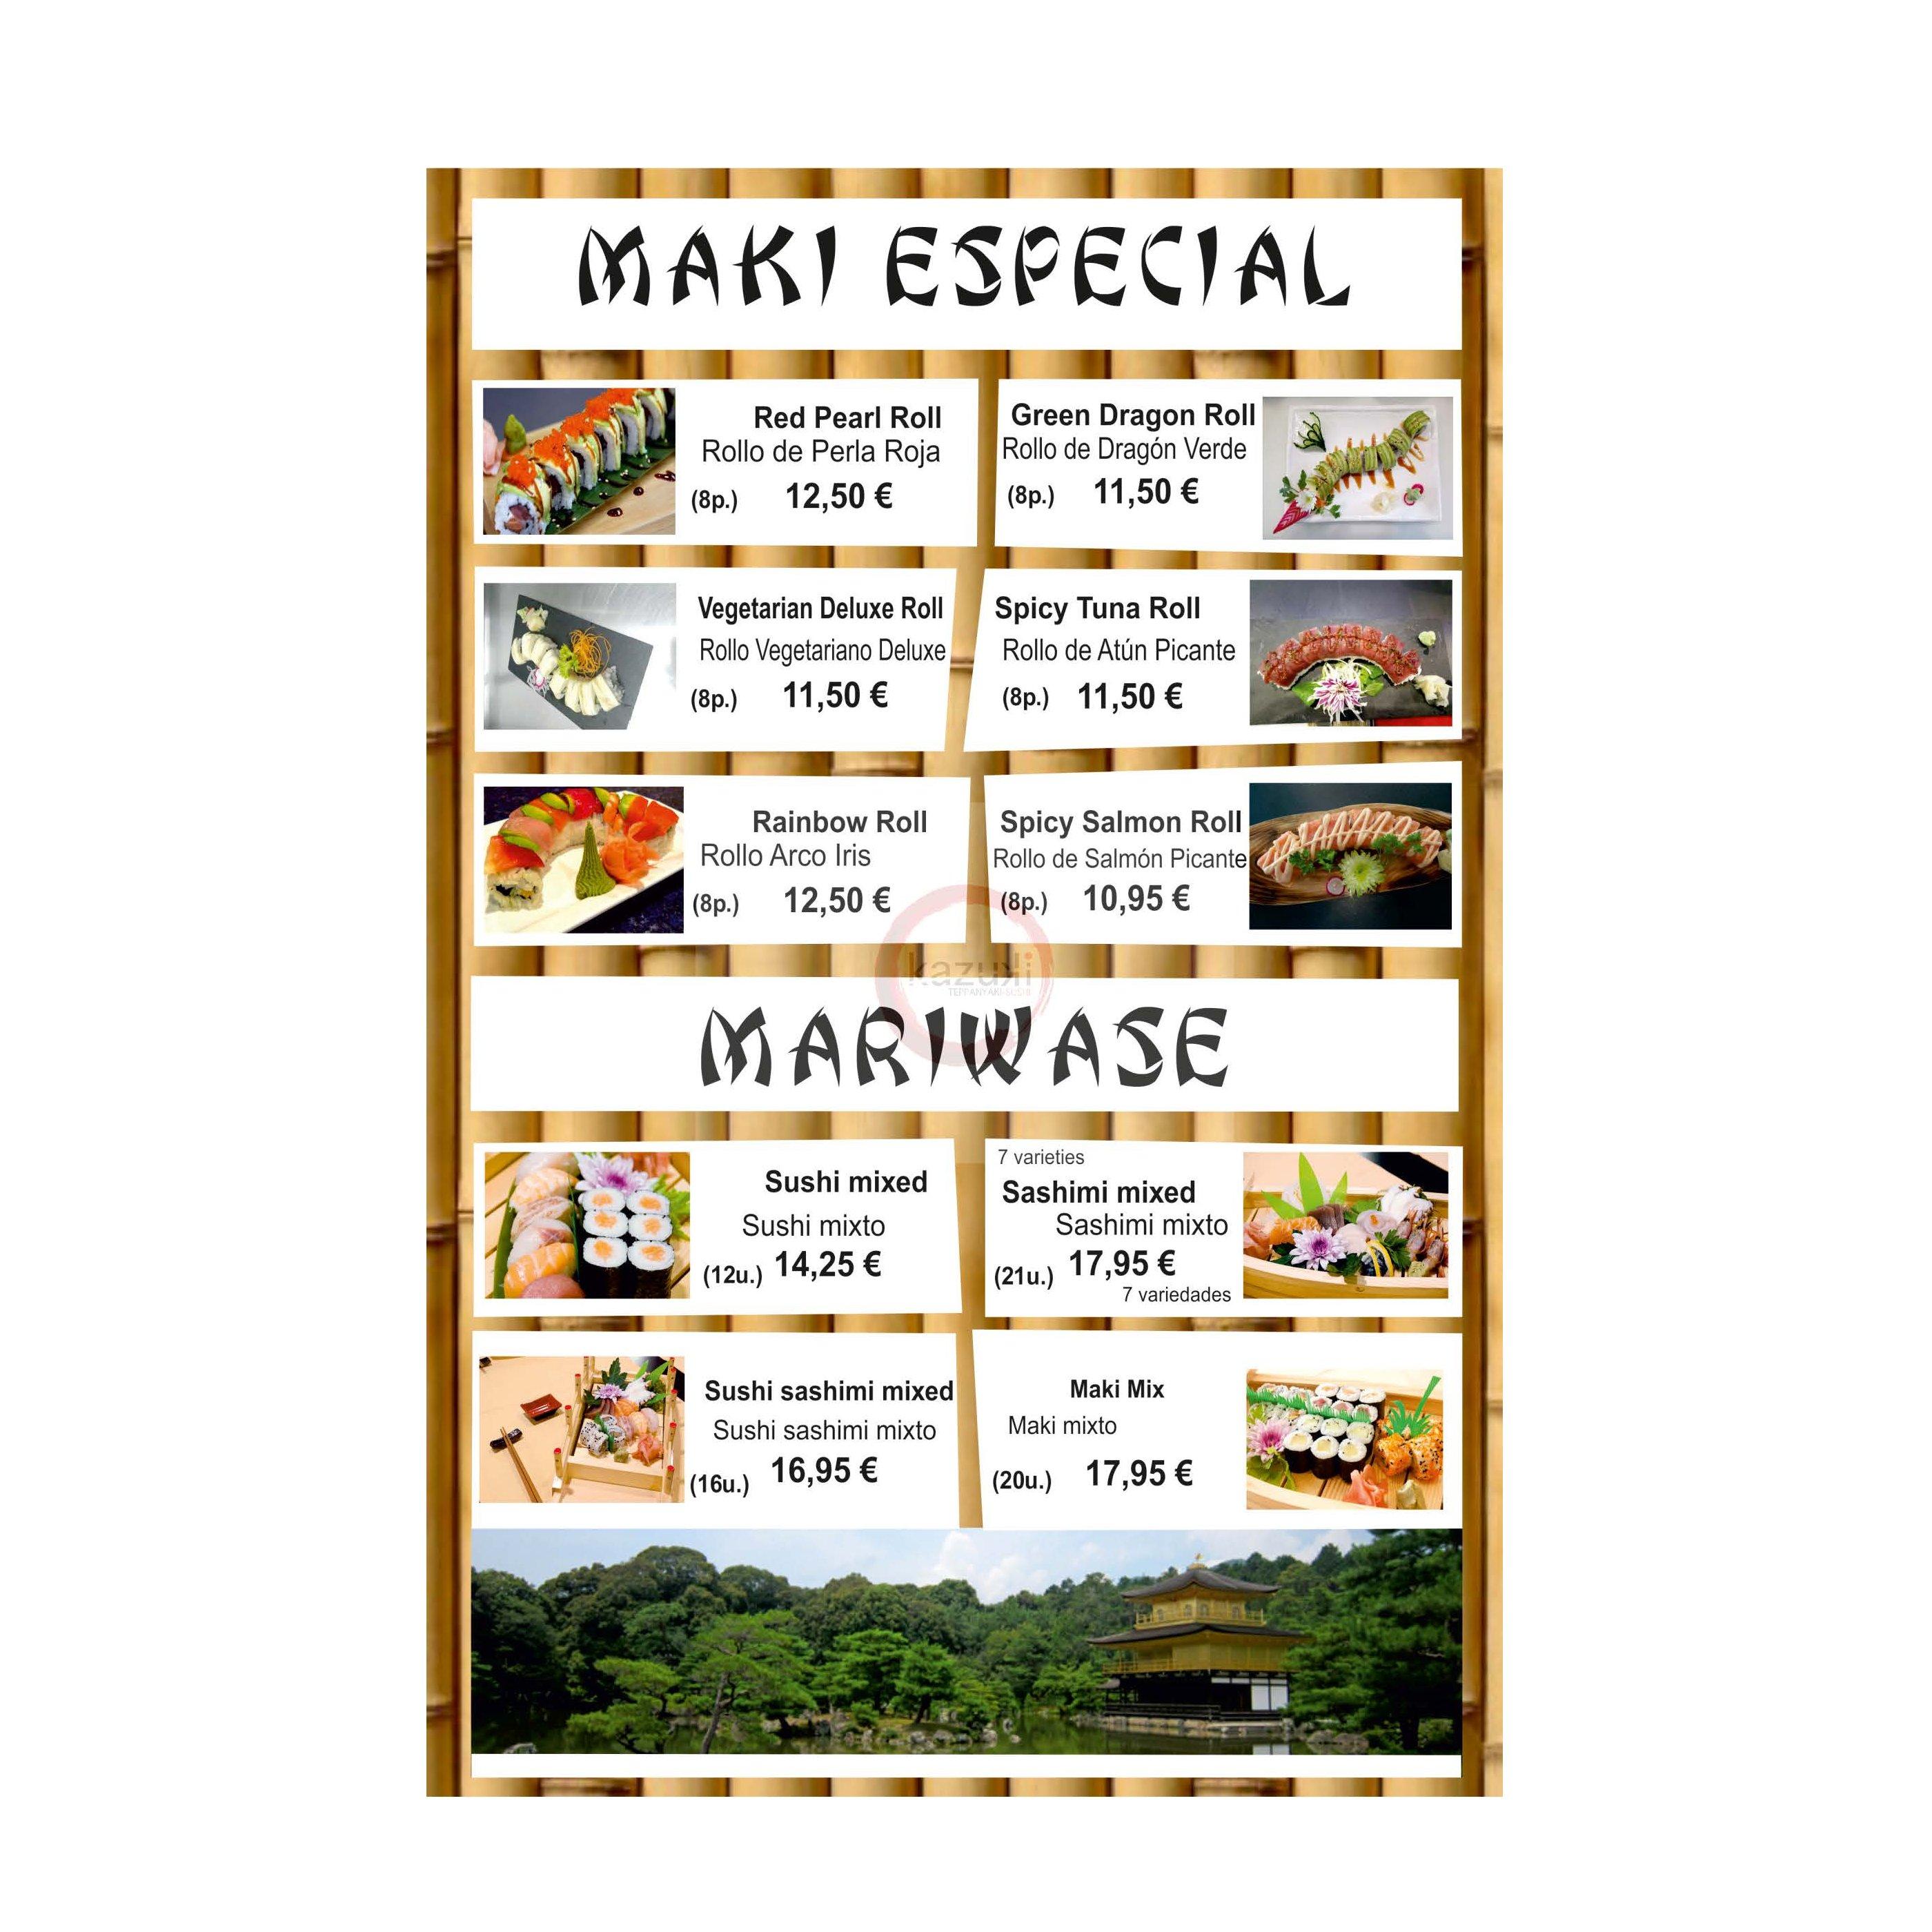 Maki especial / Mariwase: Carta y menú de Restaurante Teppanyaki Kazuki